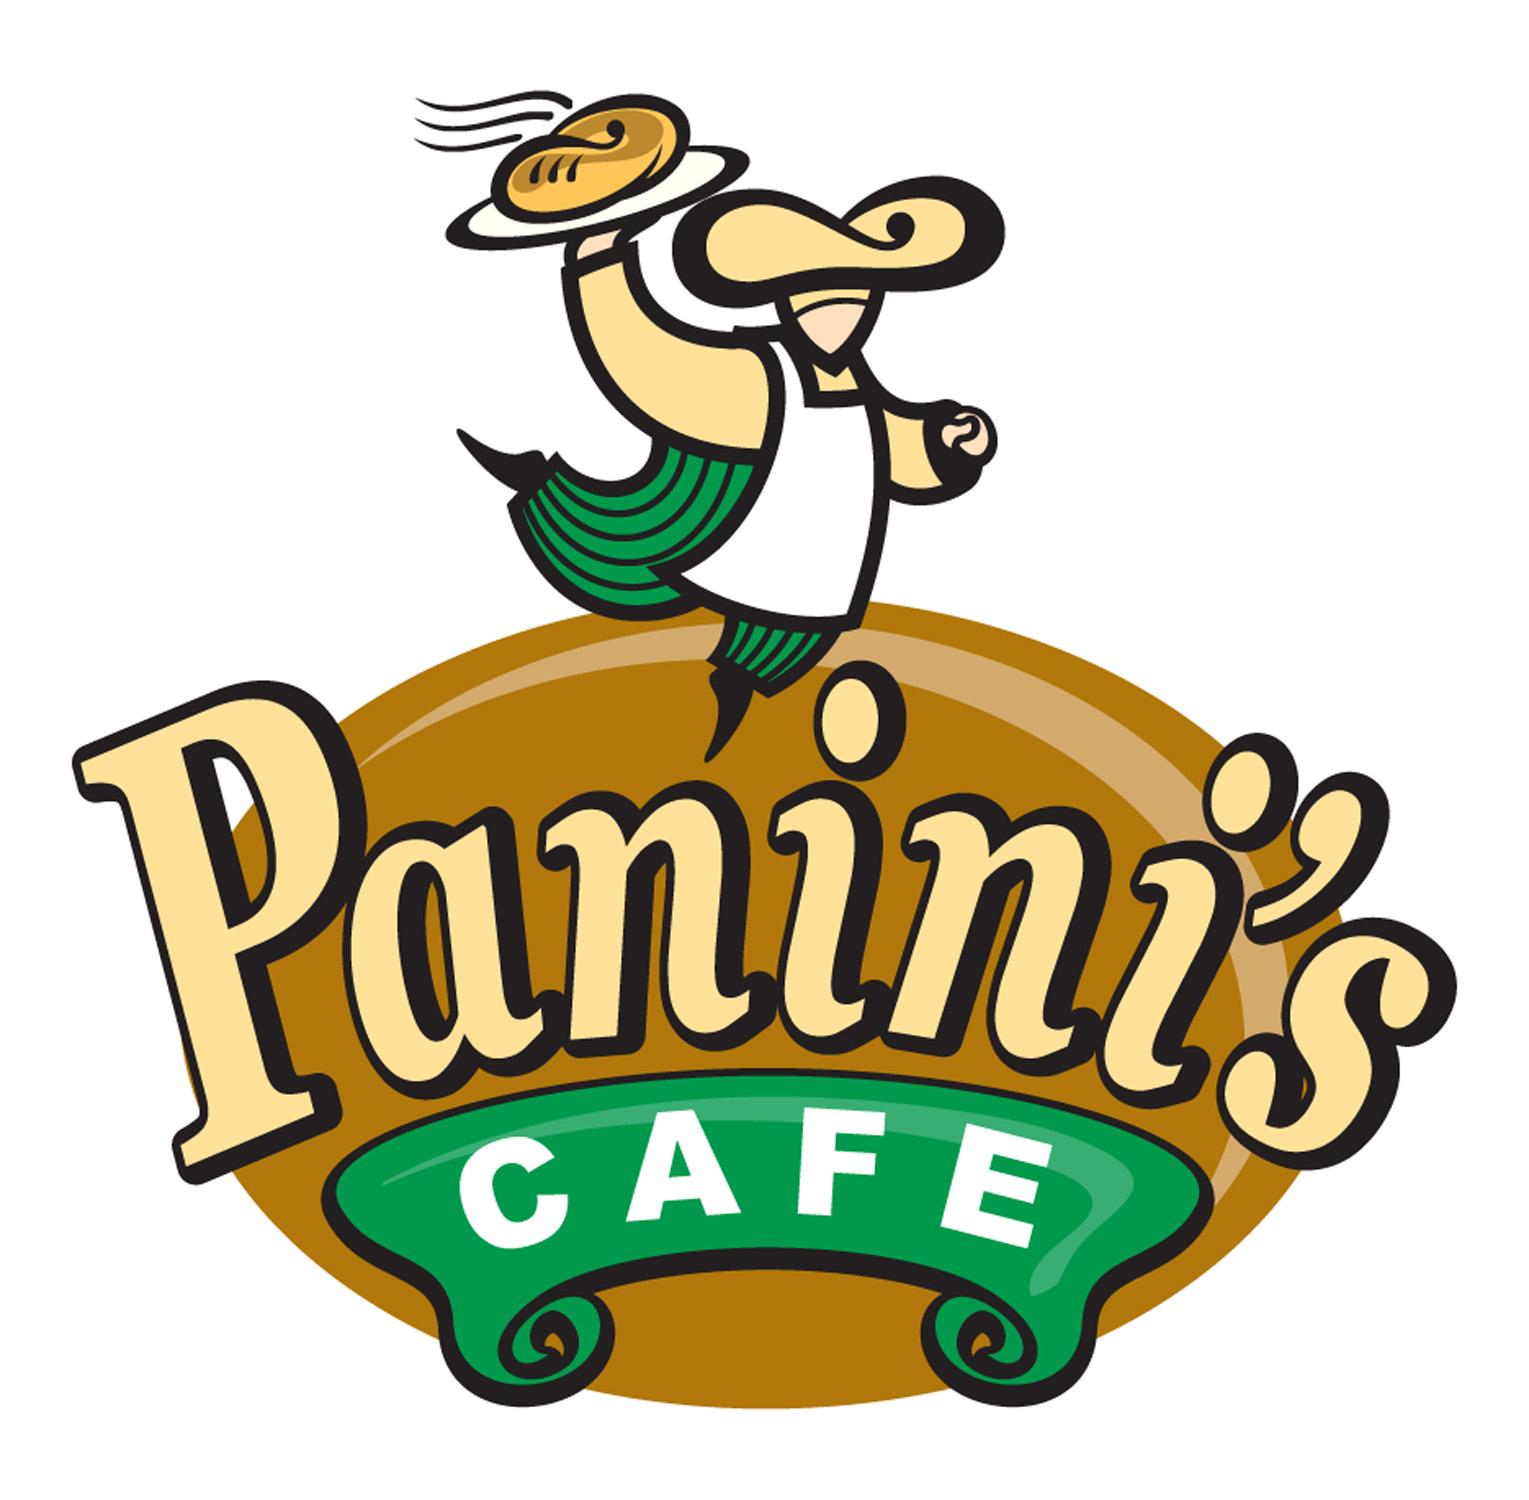 panini logo 2c.jpg